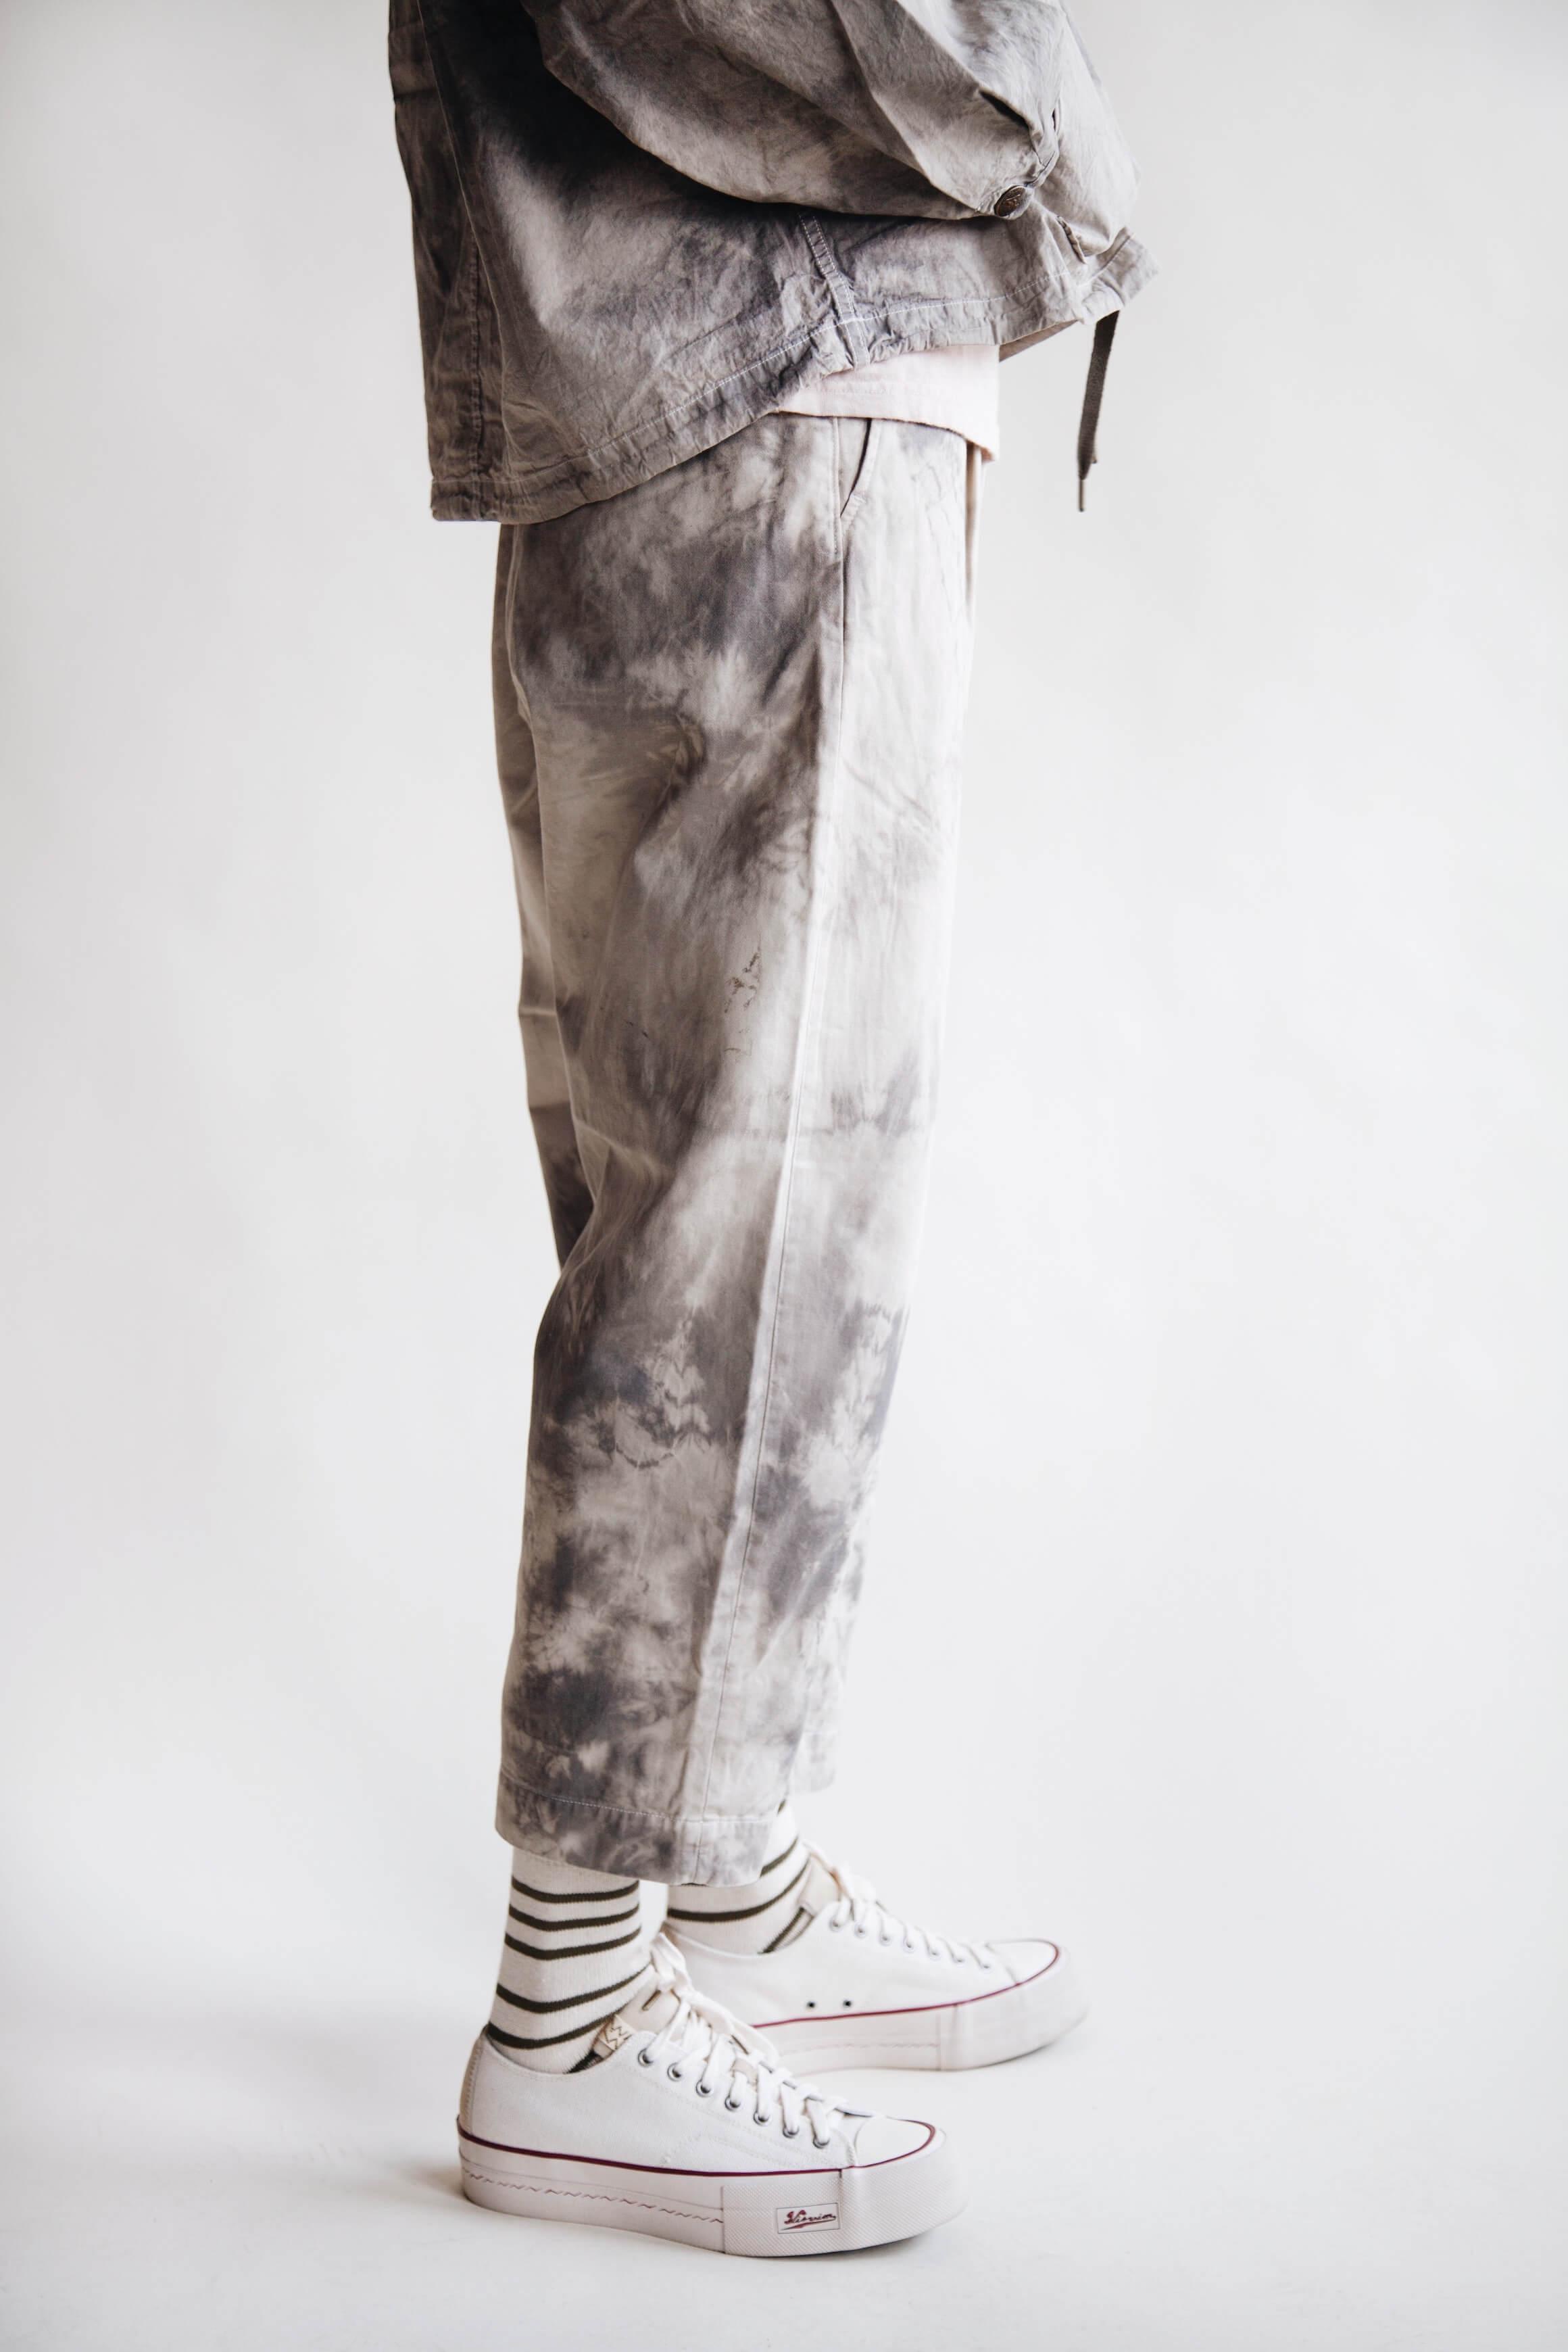 kapital clothing japan dump cotton zip anorak, katsugari high waist nime pants ashbury dyed and visvim skagway shoes on body